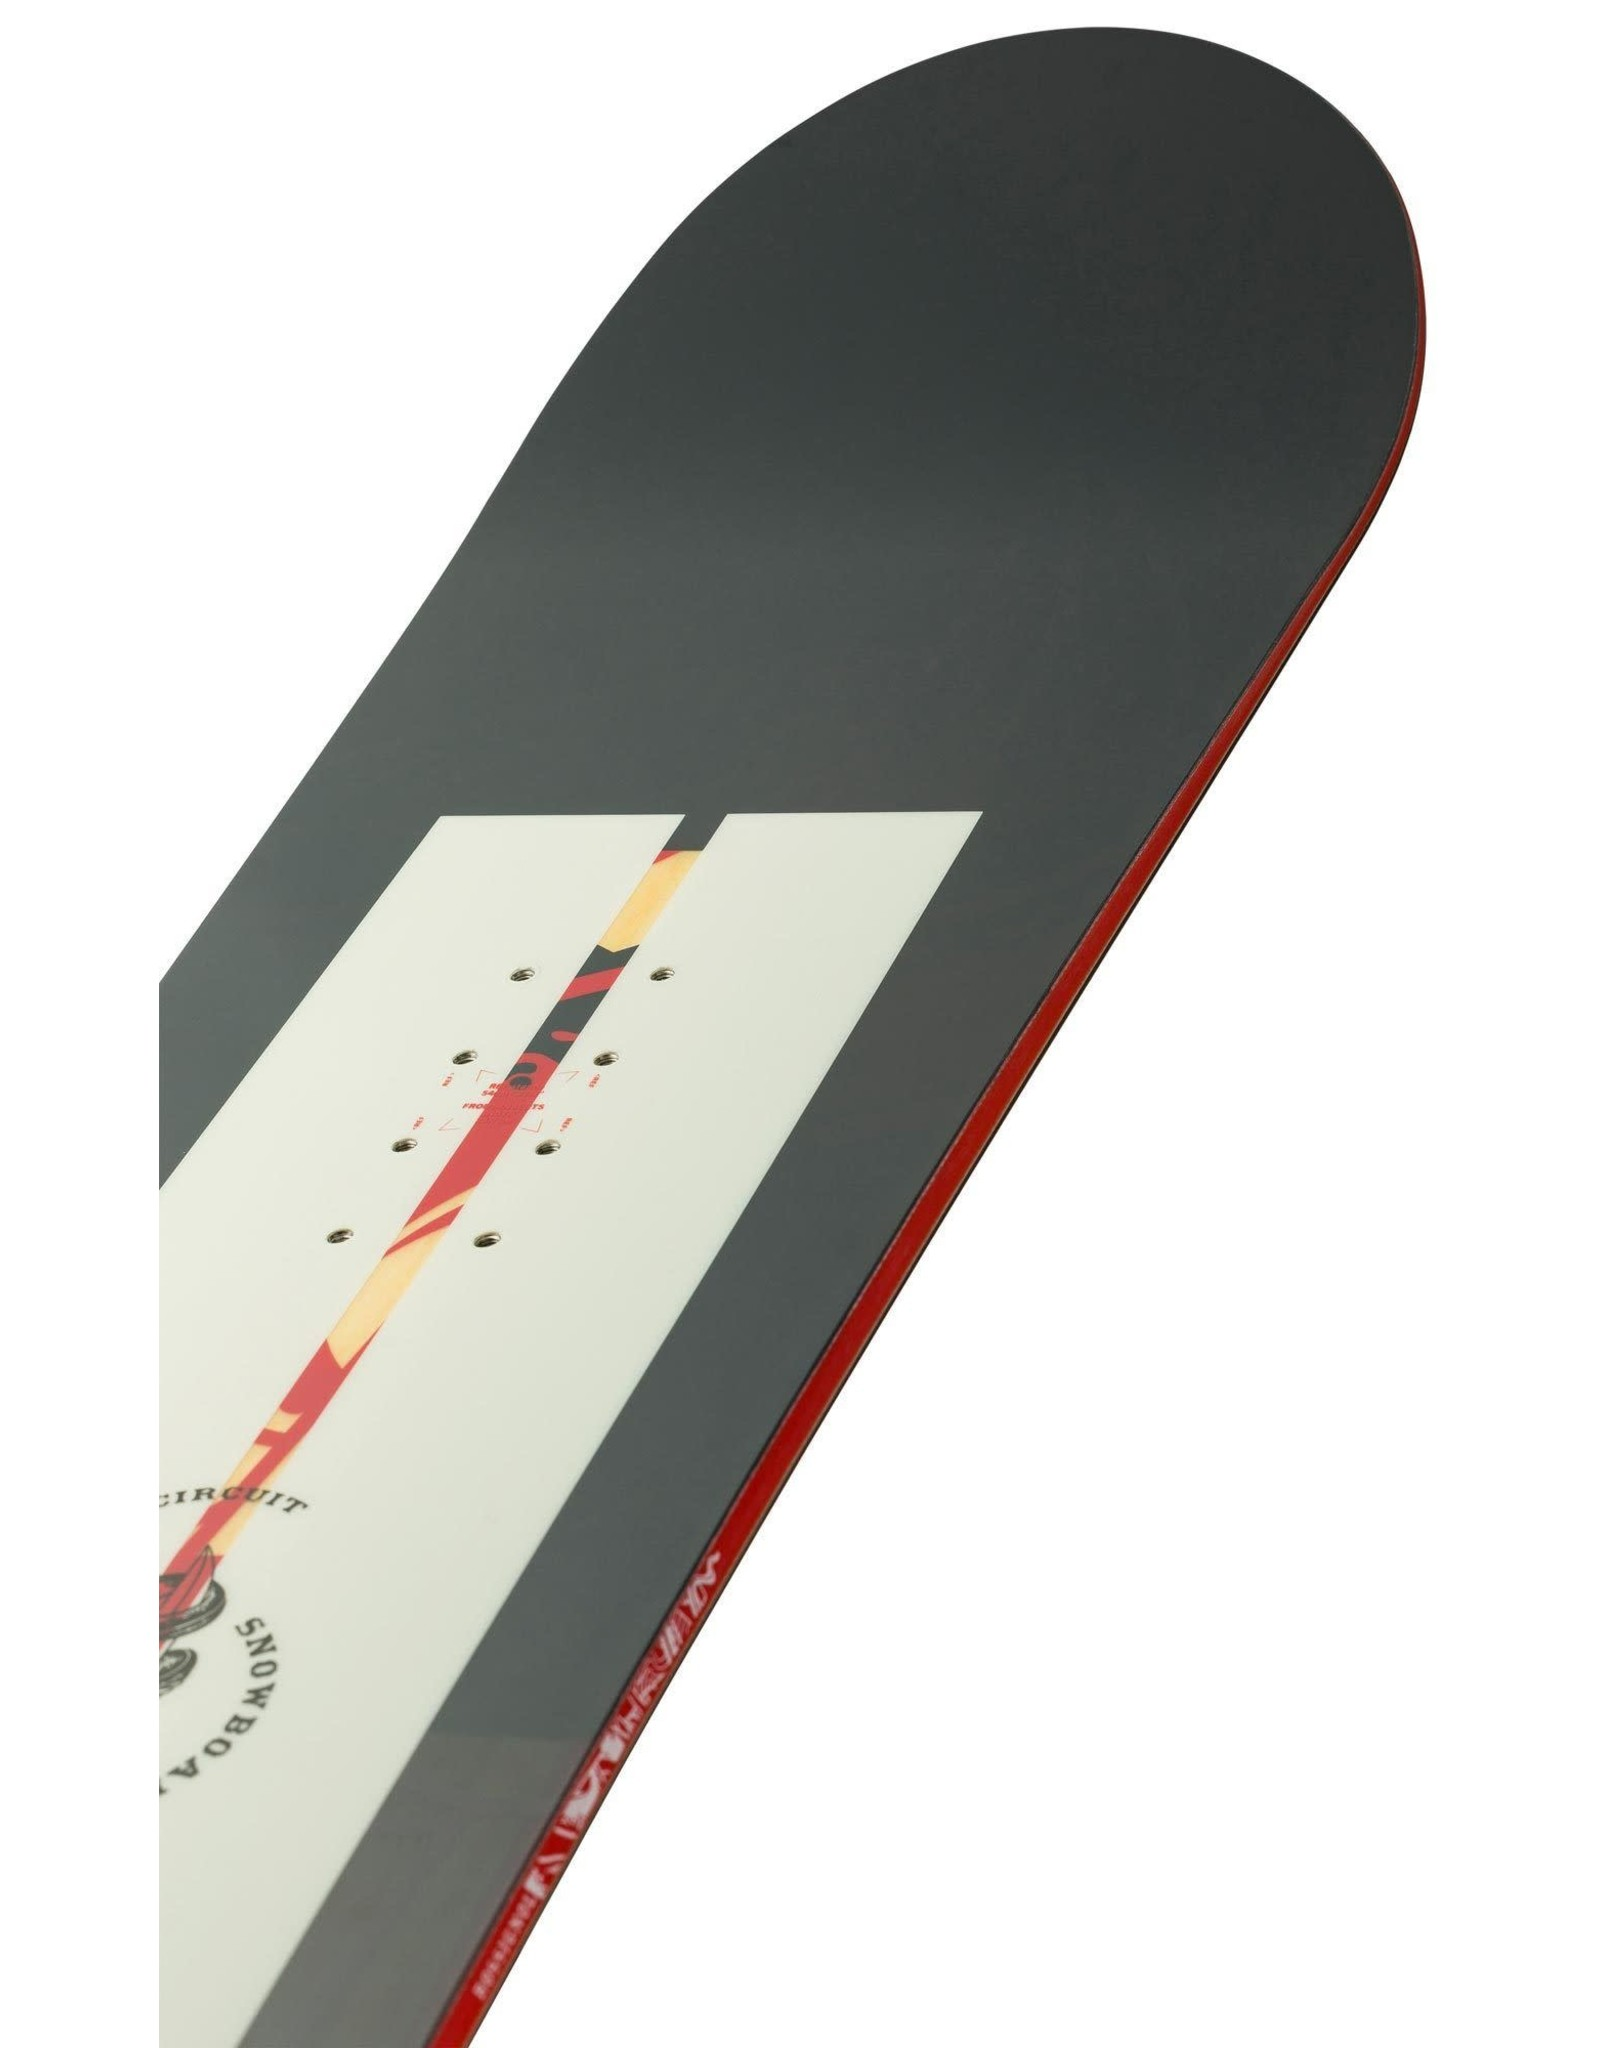 ROSSIGNOL ROSSIGNOL CIRCUIT SNOWBOARD SR 20